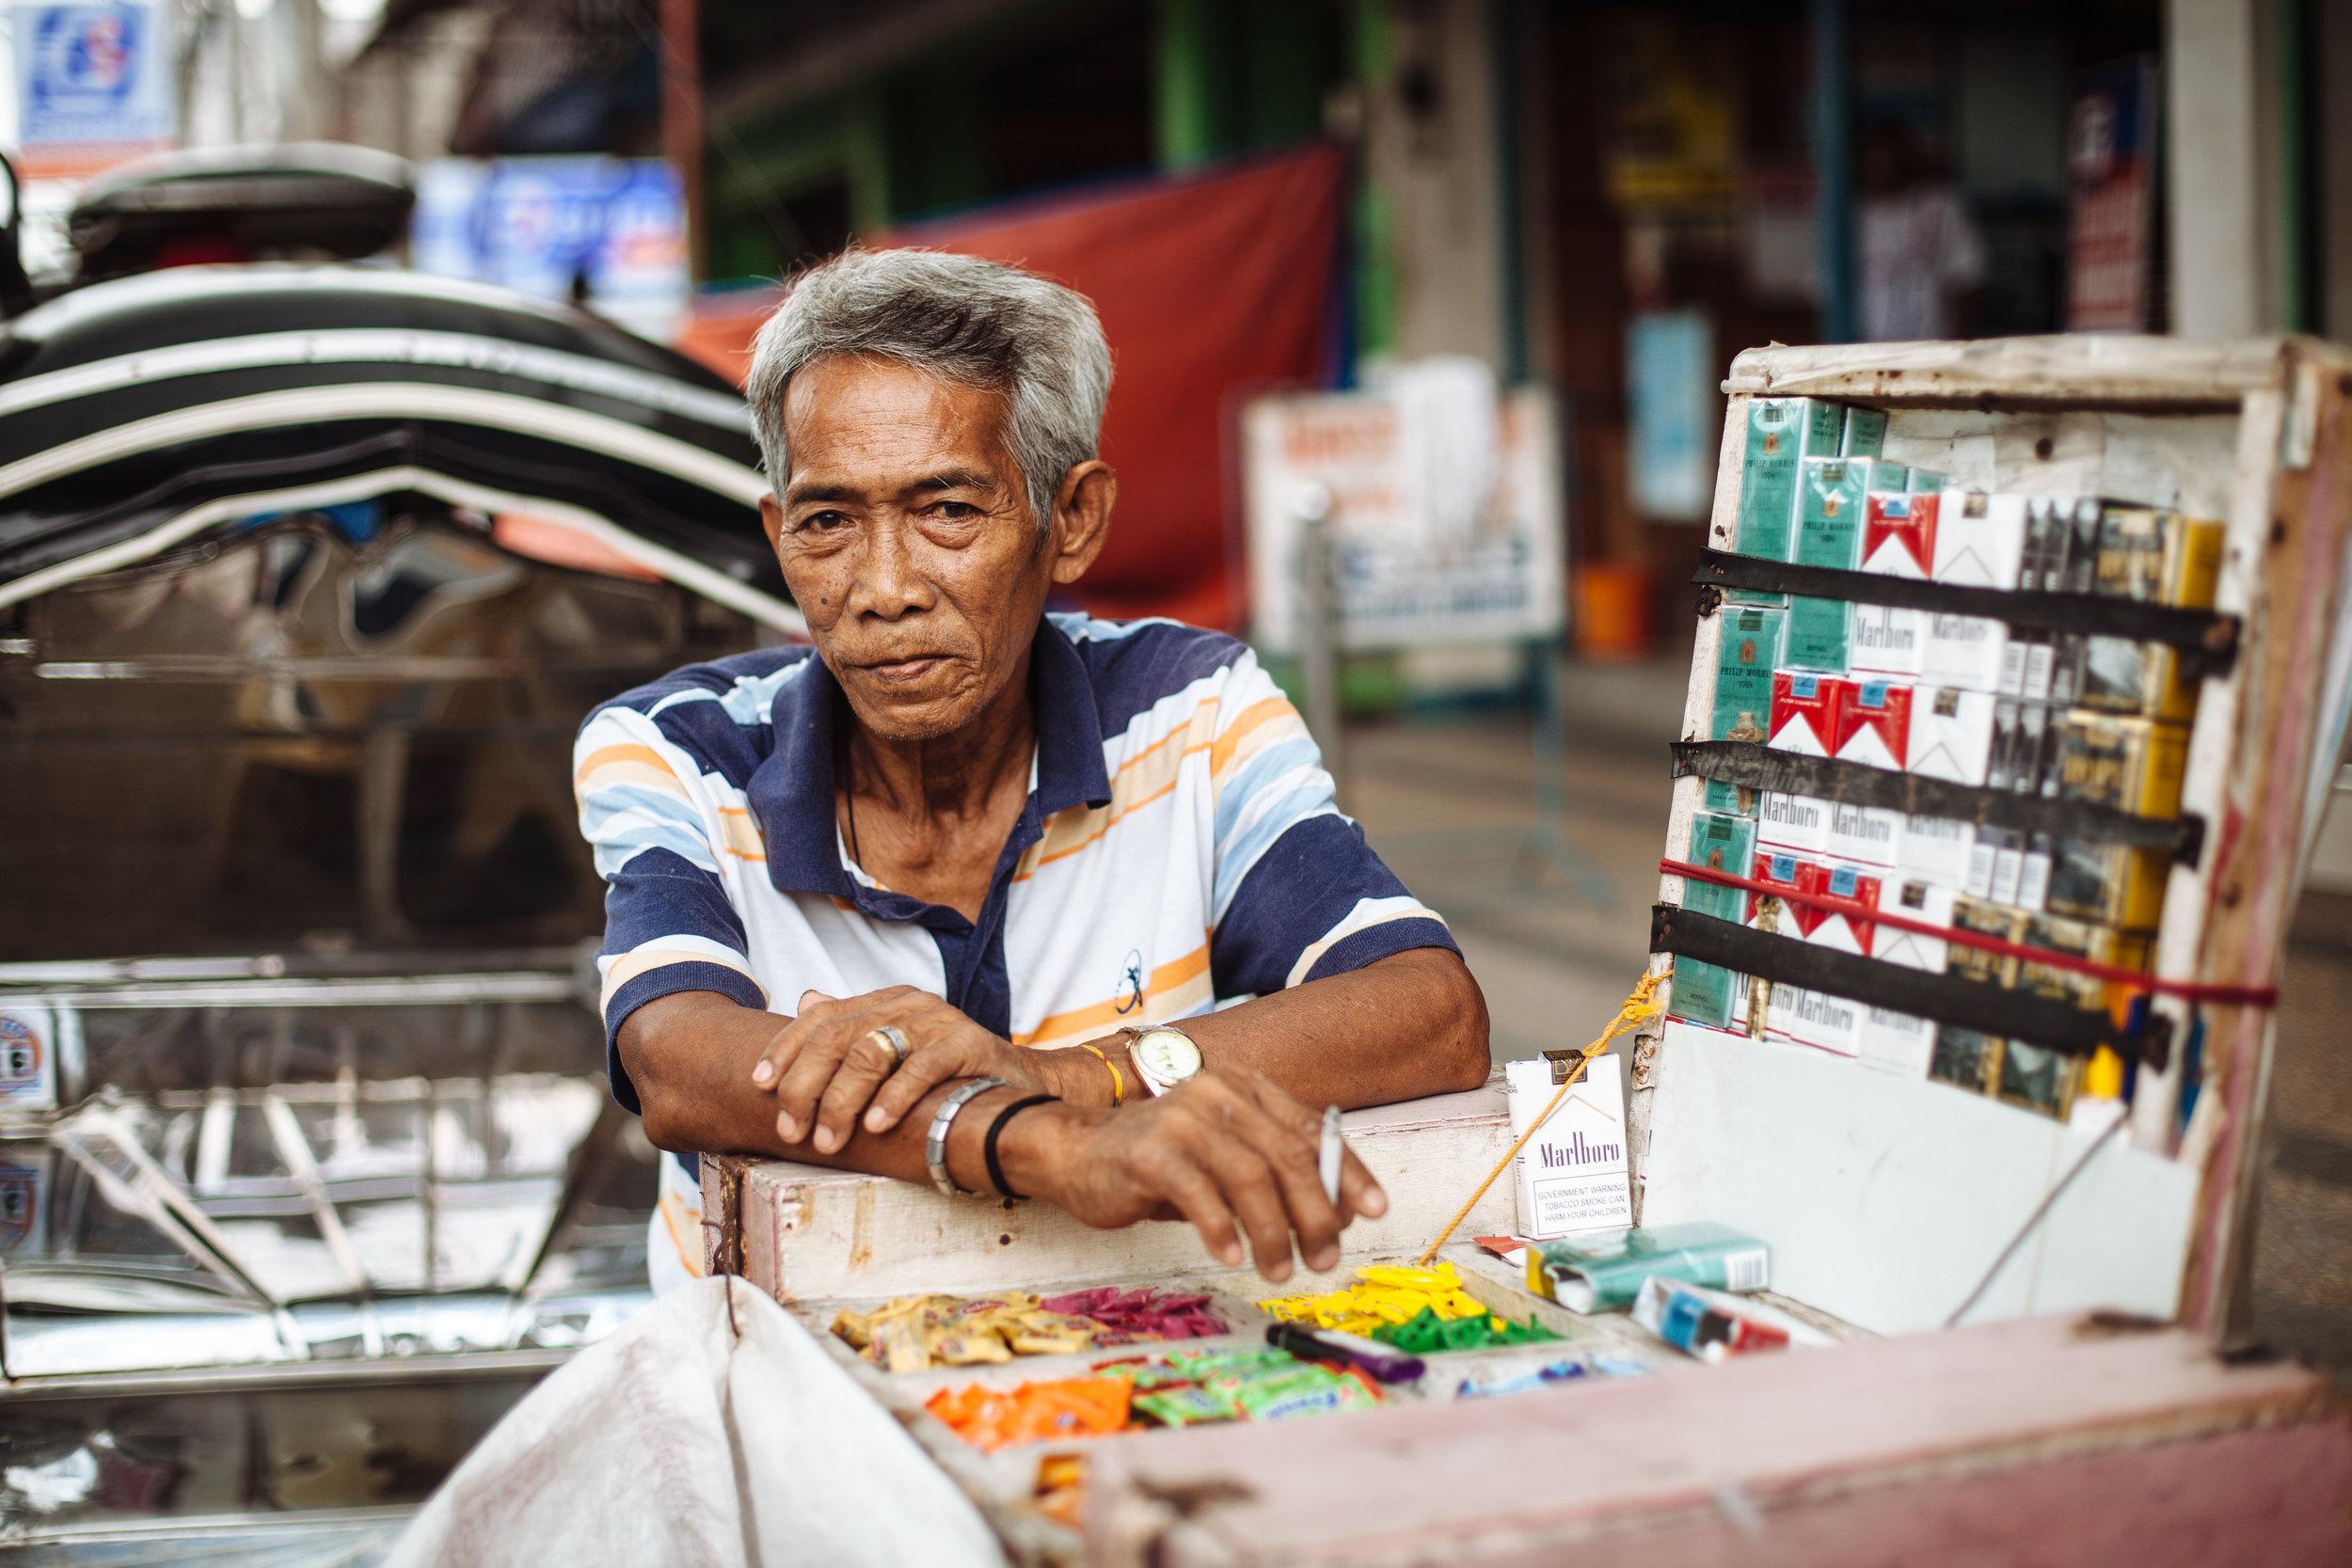 20121116_KU_Philippines_235.jpg